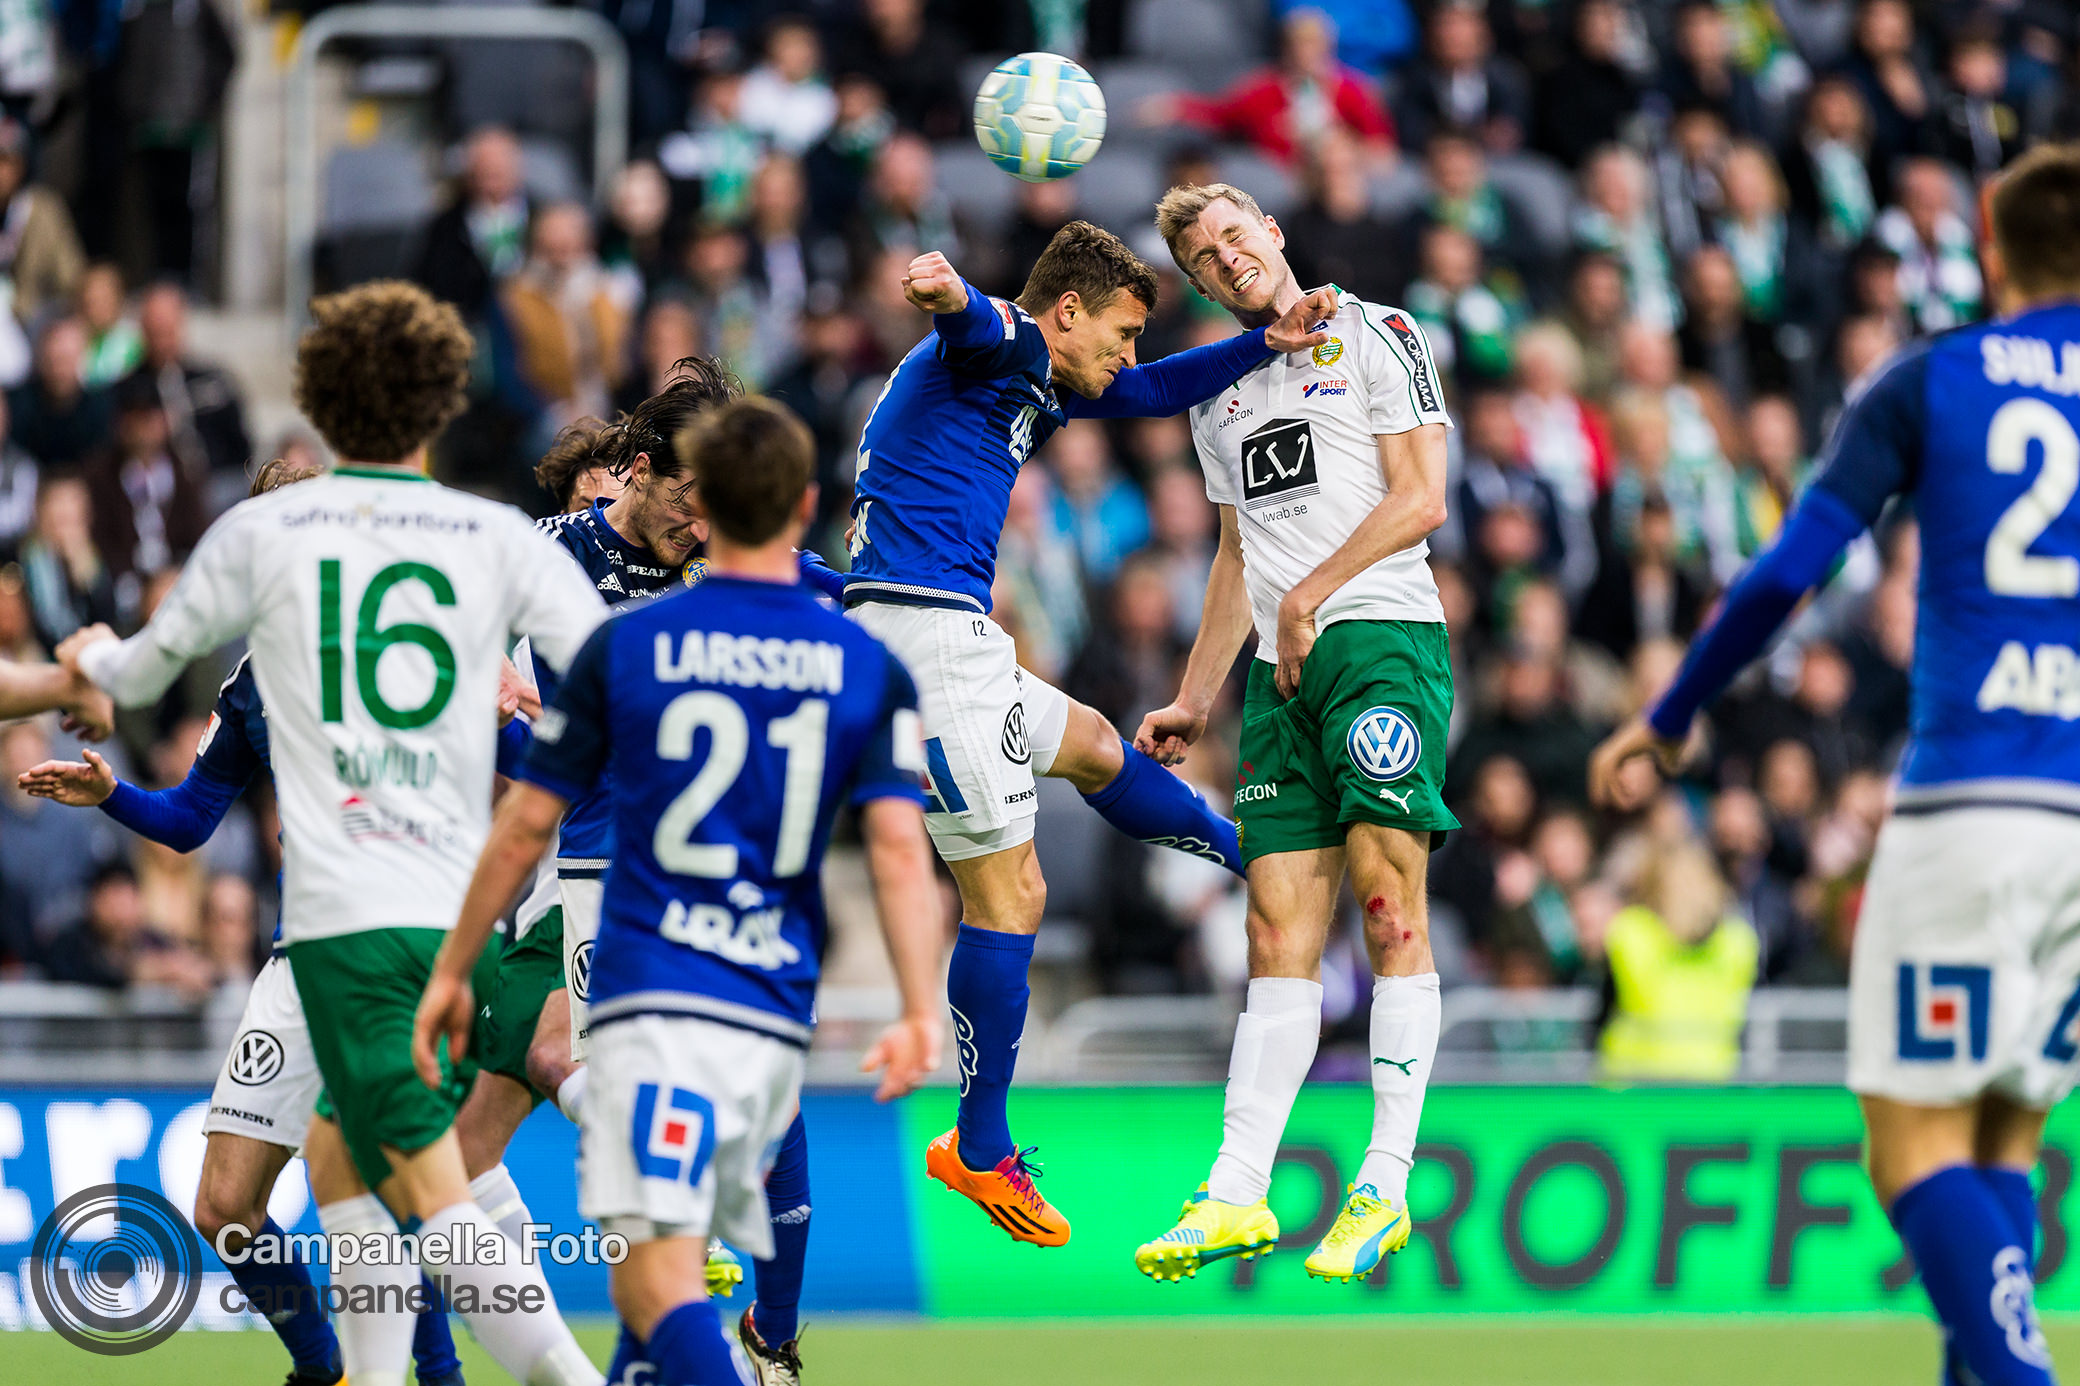 Hammarby fails to defeat Sundsvall